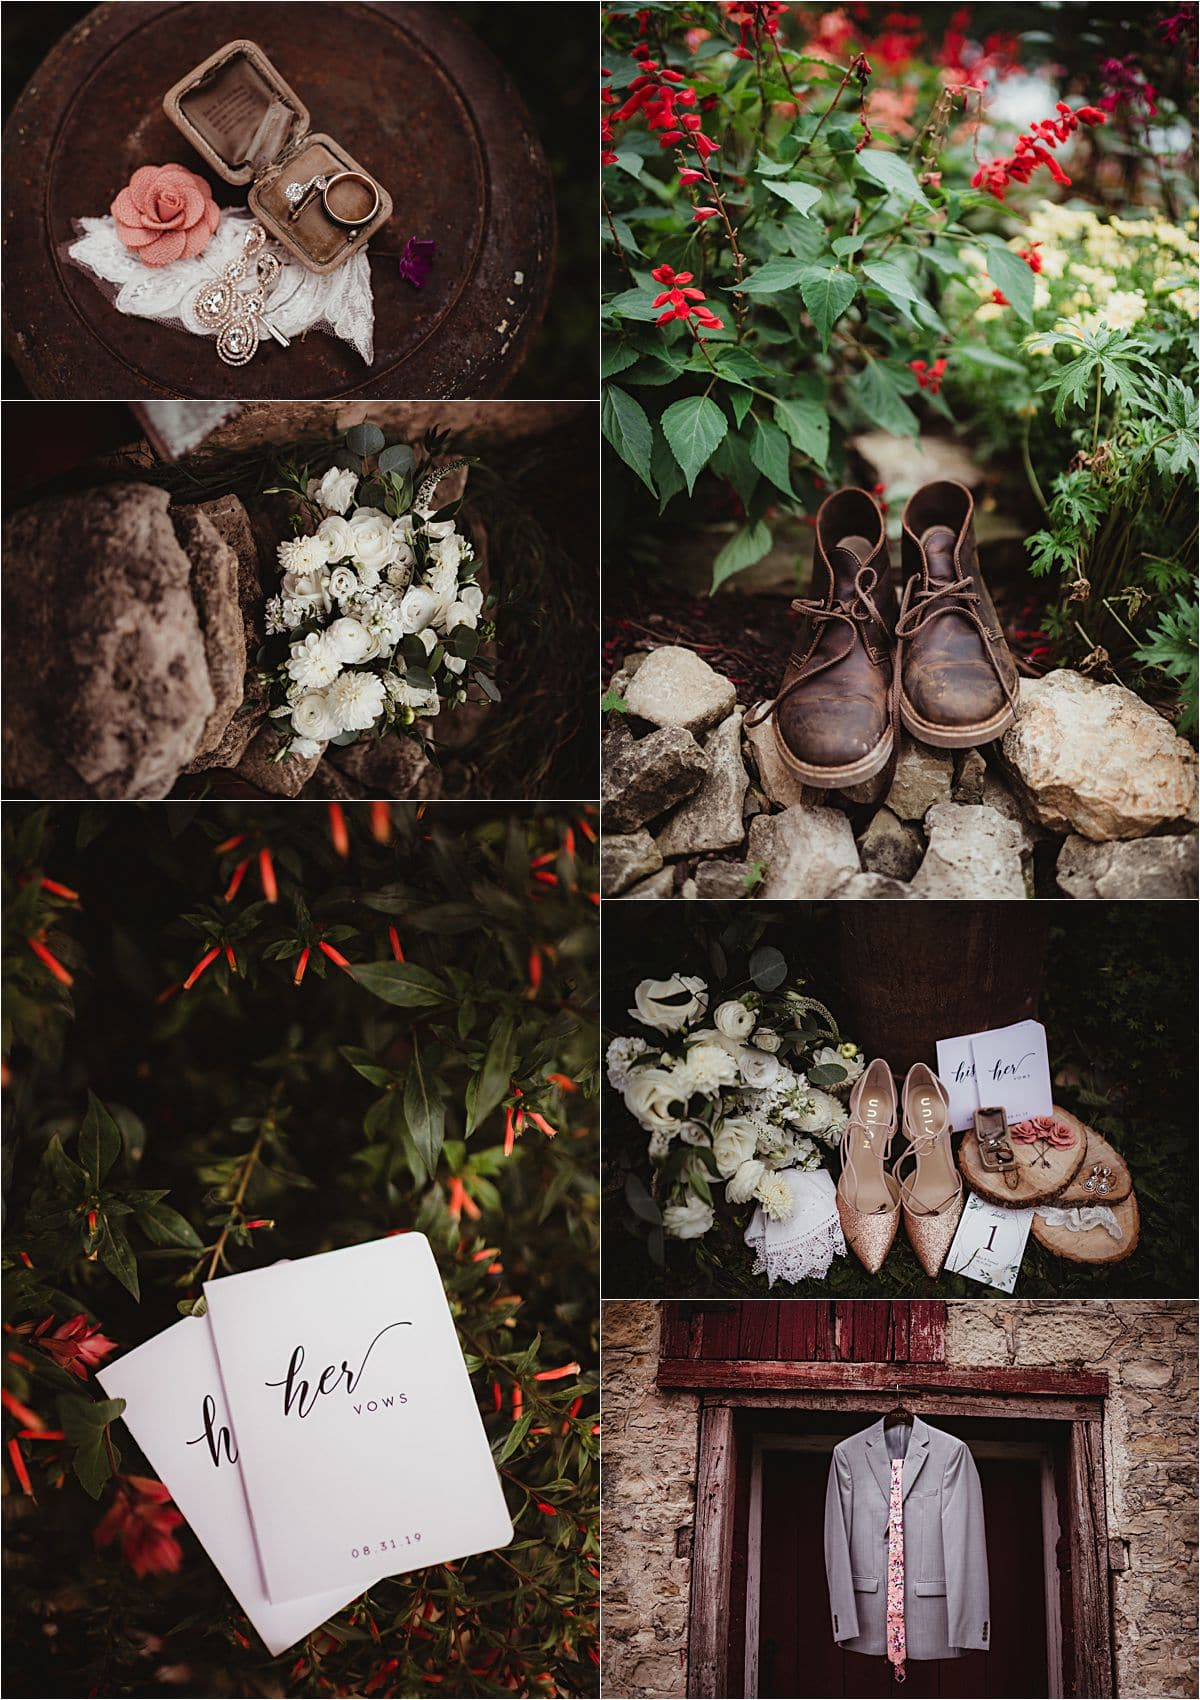 Over the Vines Wedding Details